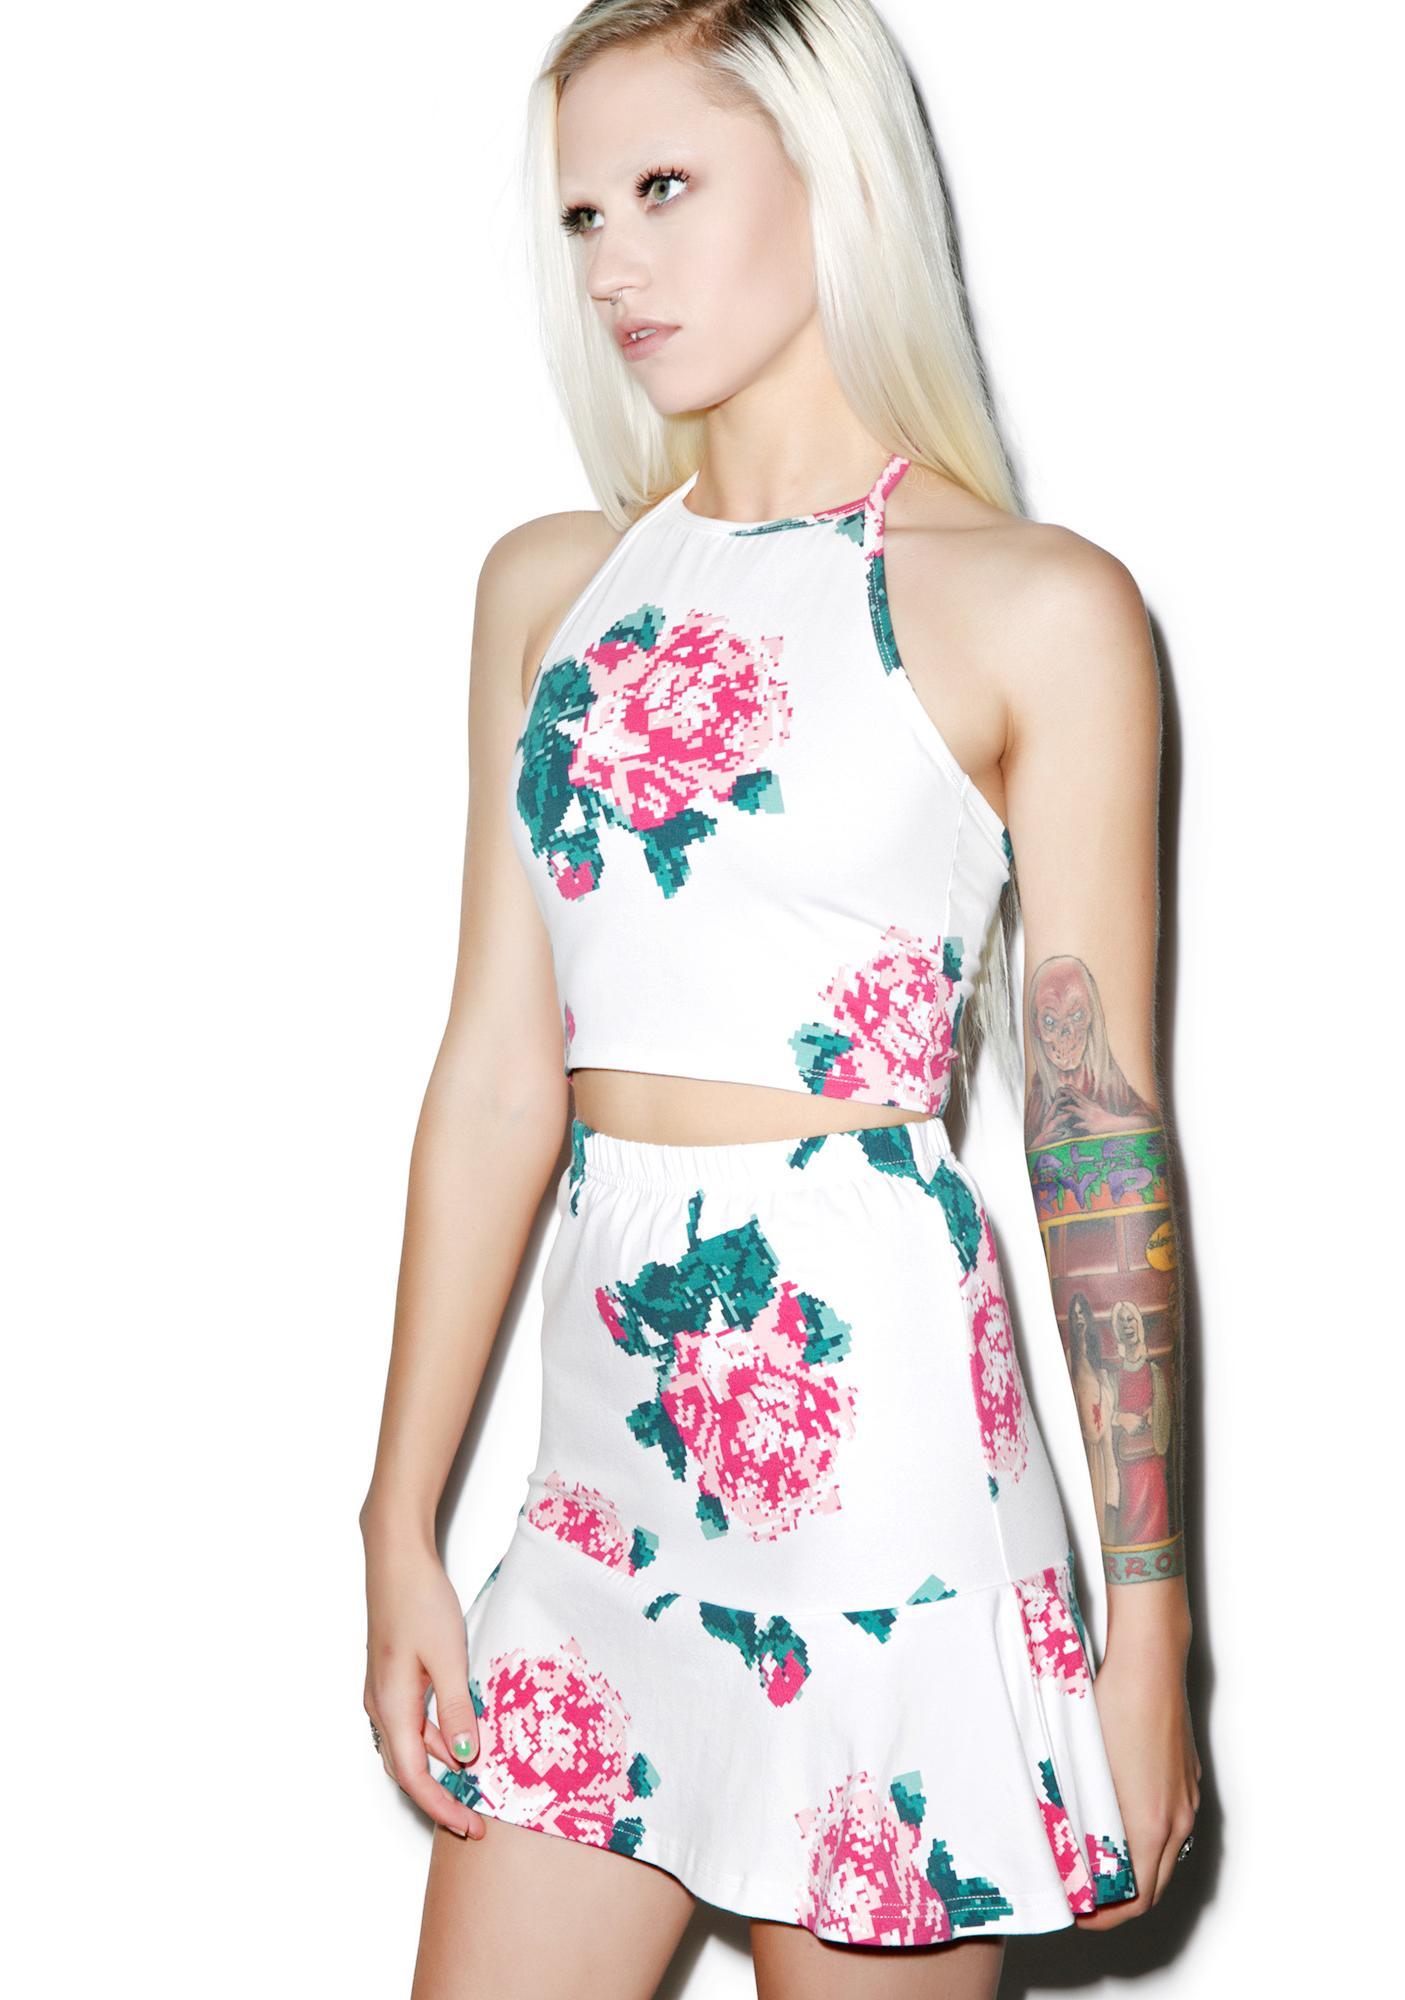 Joyrich 8bit Floral Fit & Flare Skirt